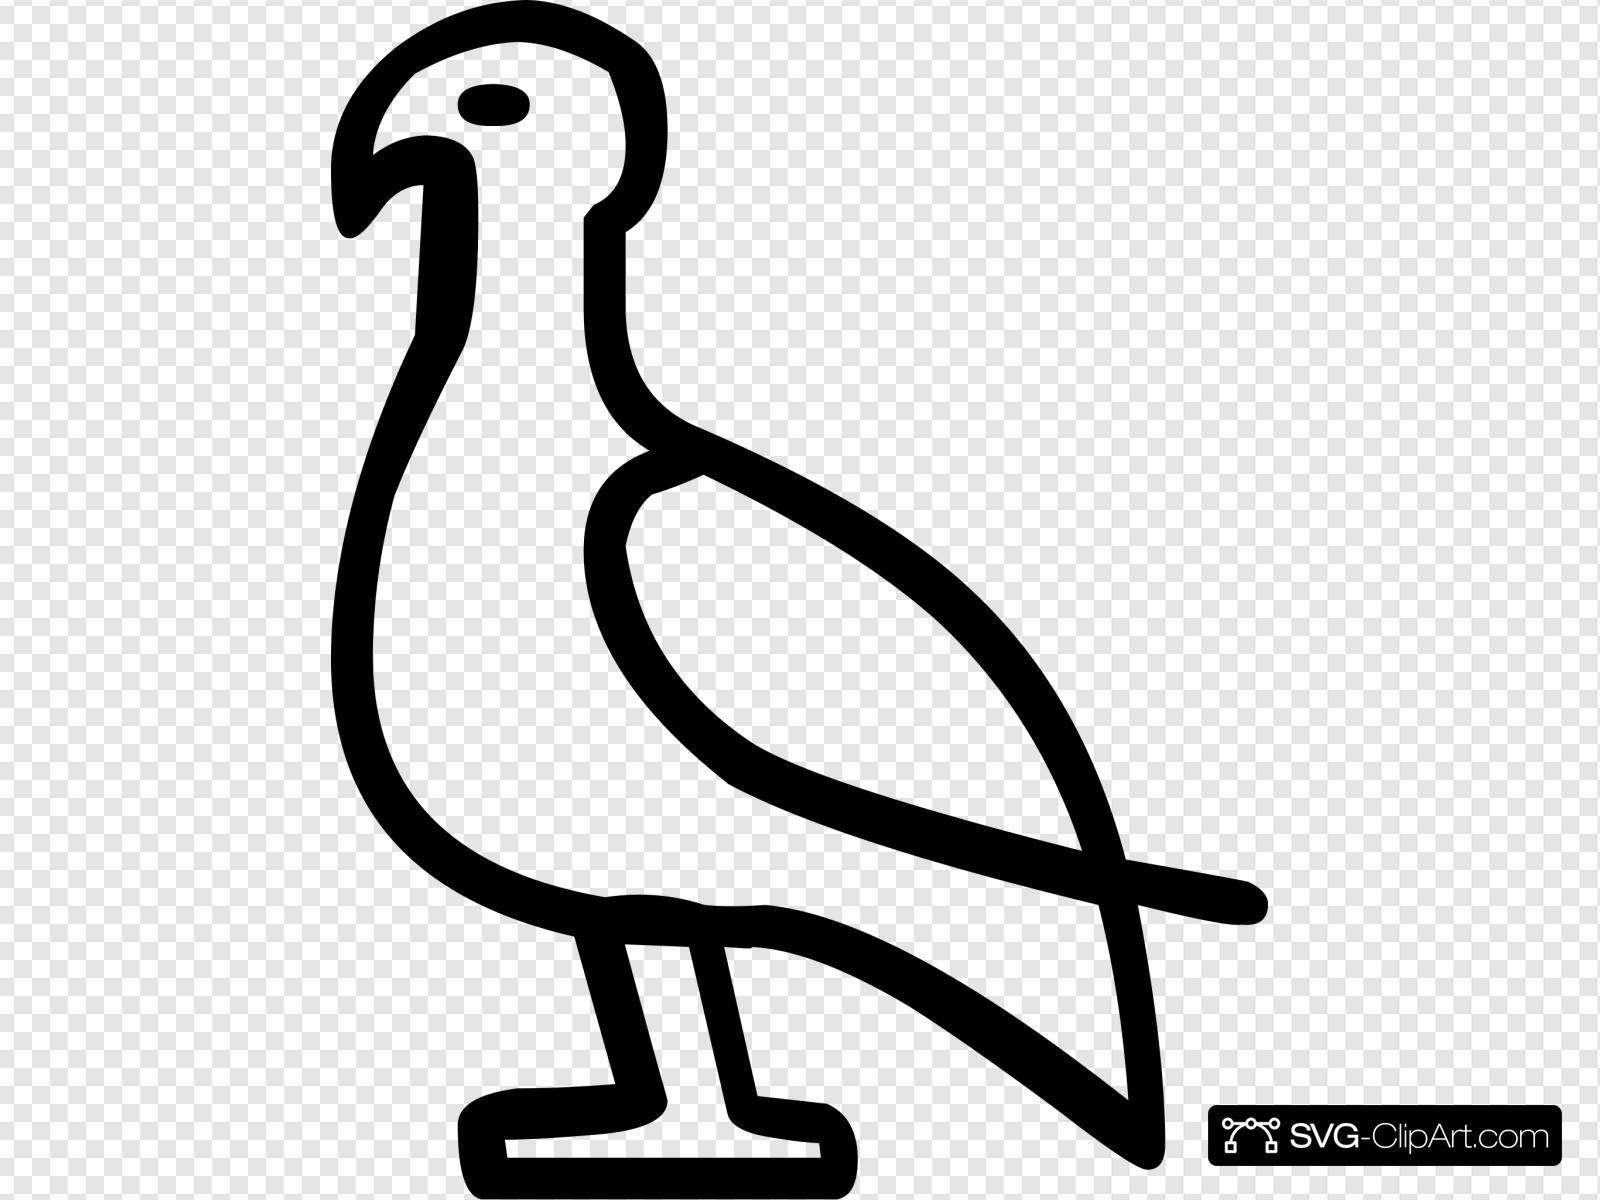 Phaistos Glyph Clip art, Icon and SVG.